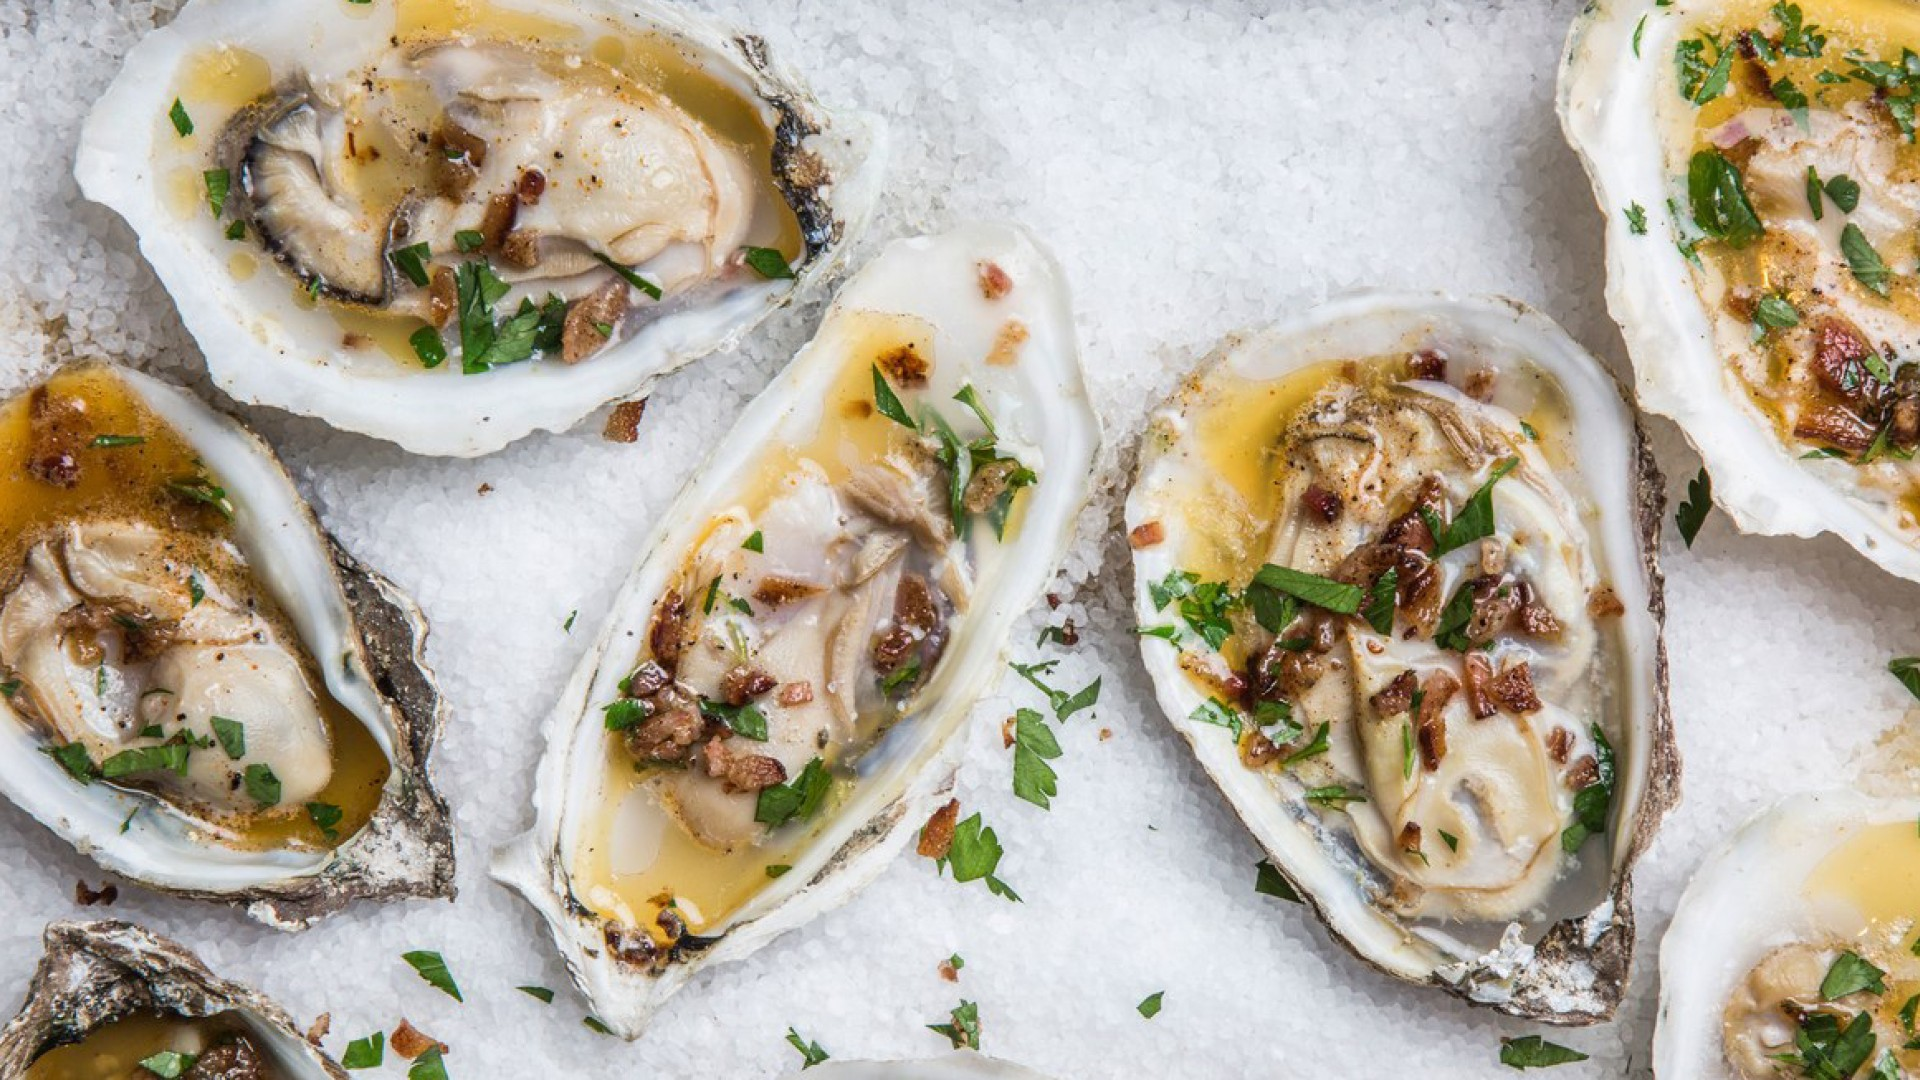 Cuisiner les huîtres : c'est possible !